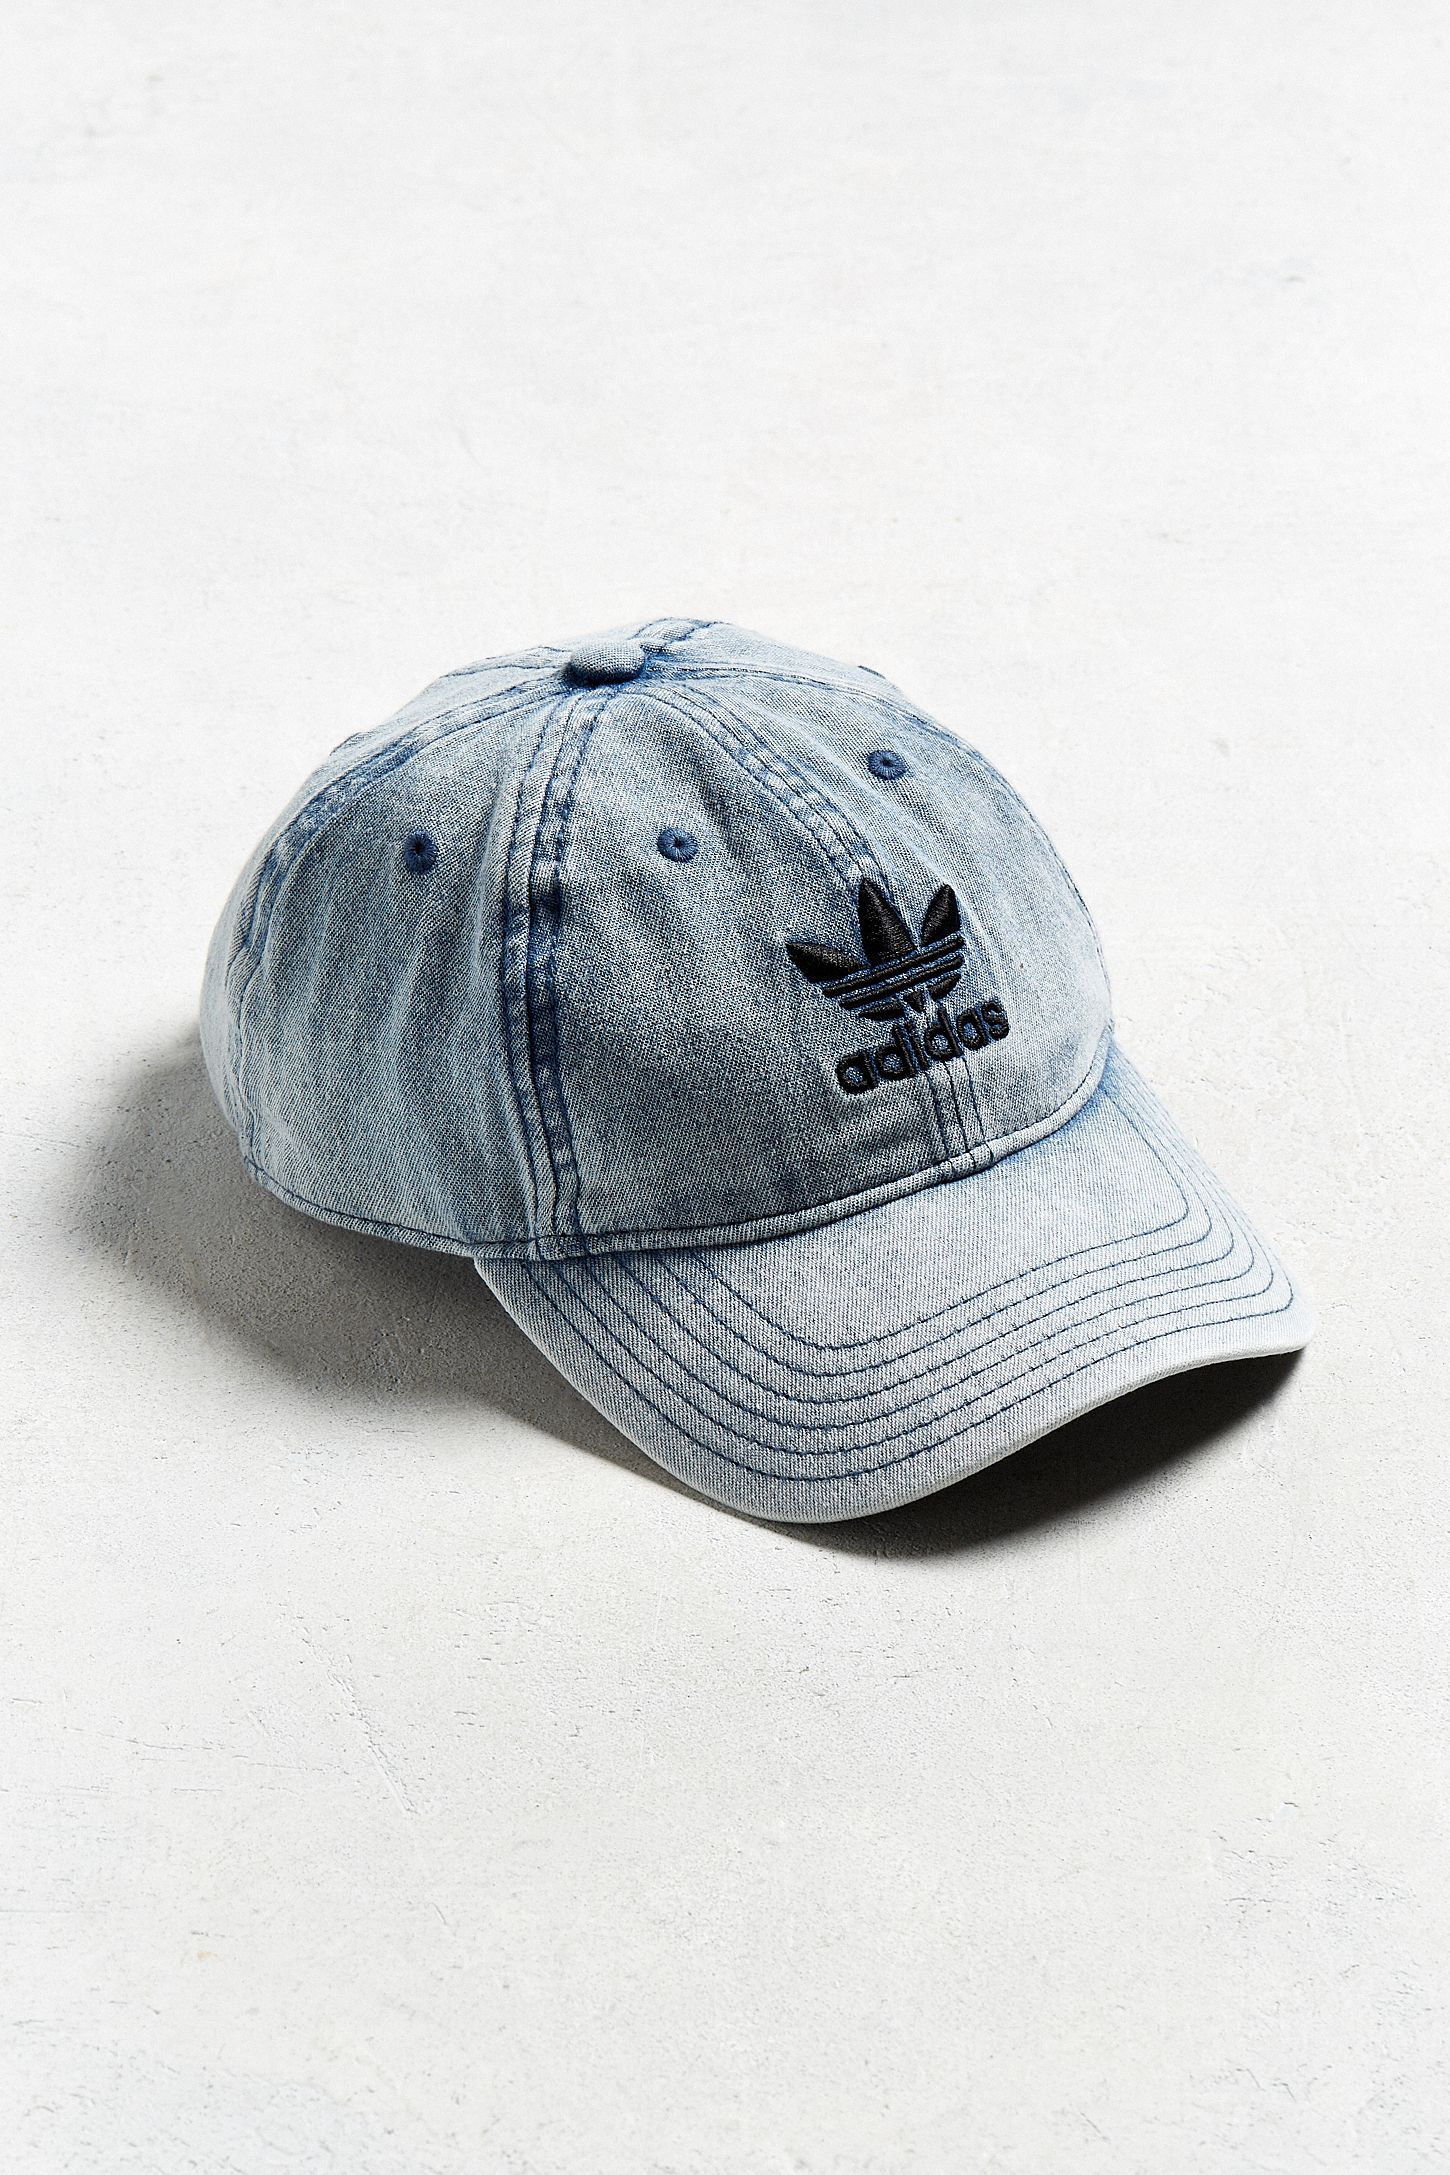 adidas Originals Relaxed Denim Baseball Hat  2914608ed64